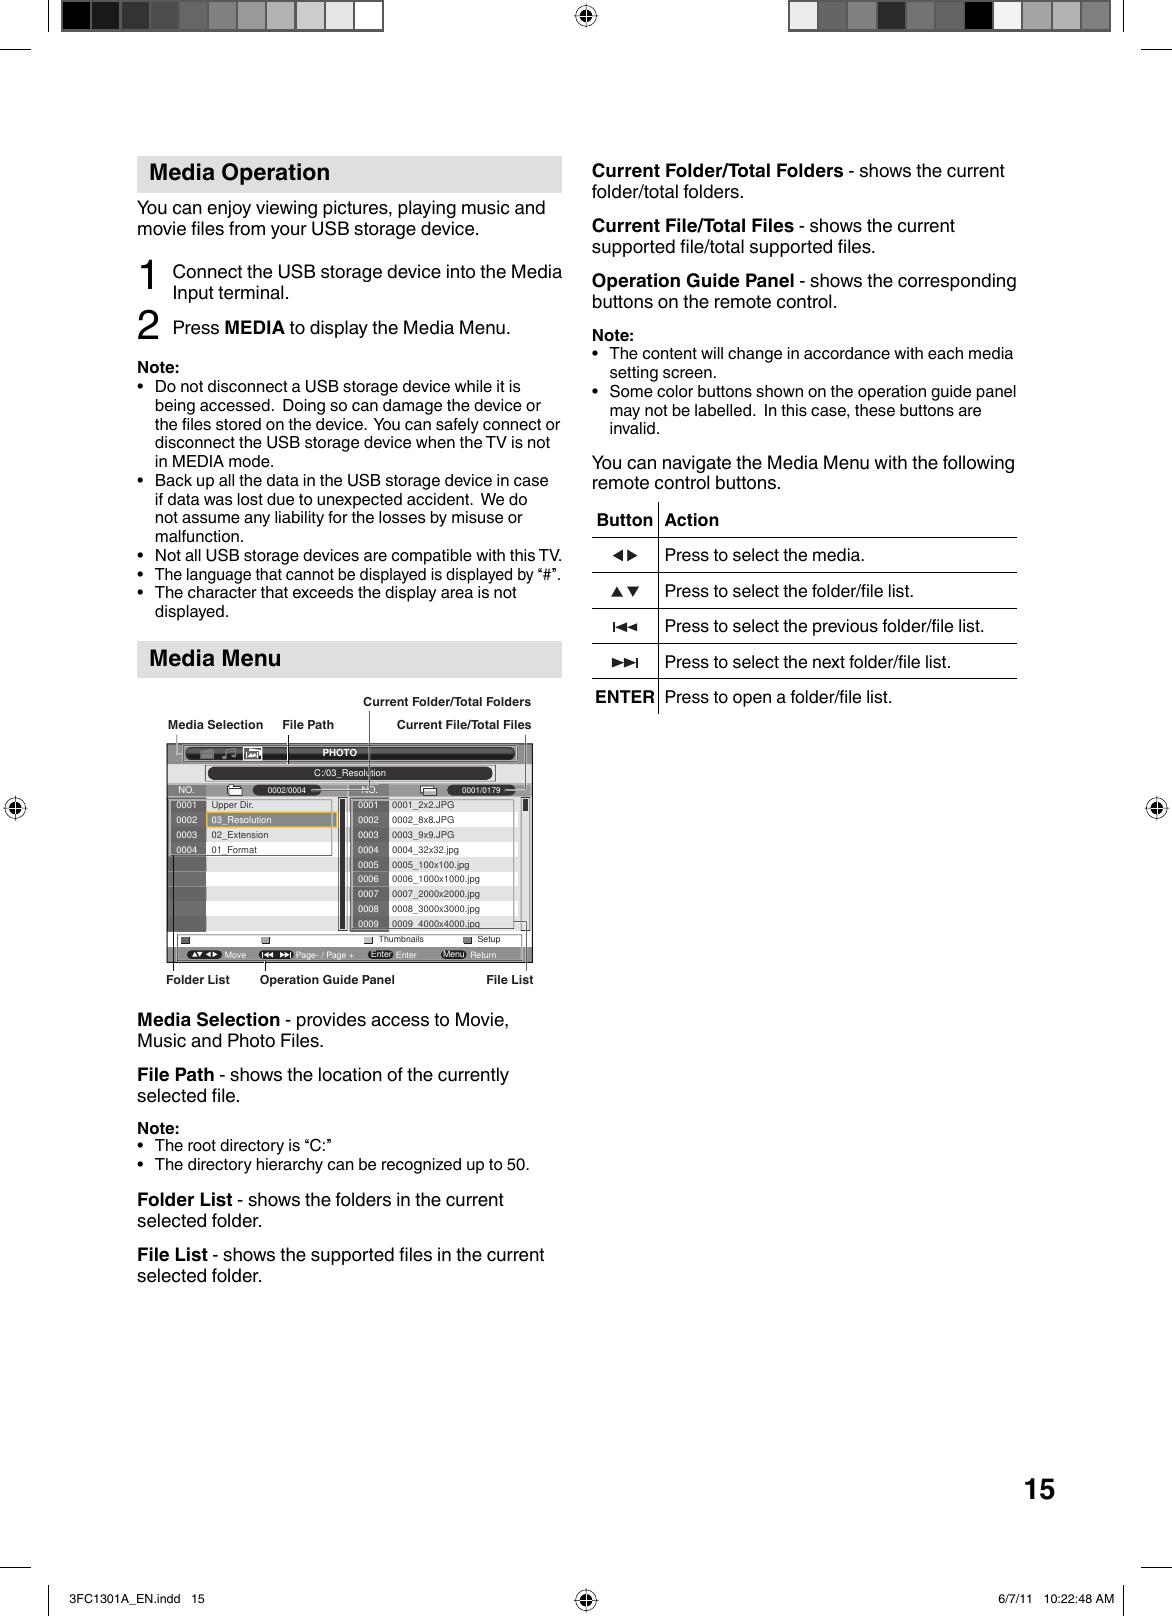 JVC LT 42G20 24G20,LT User Manual J3FC1301A